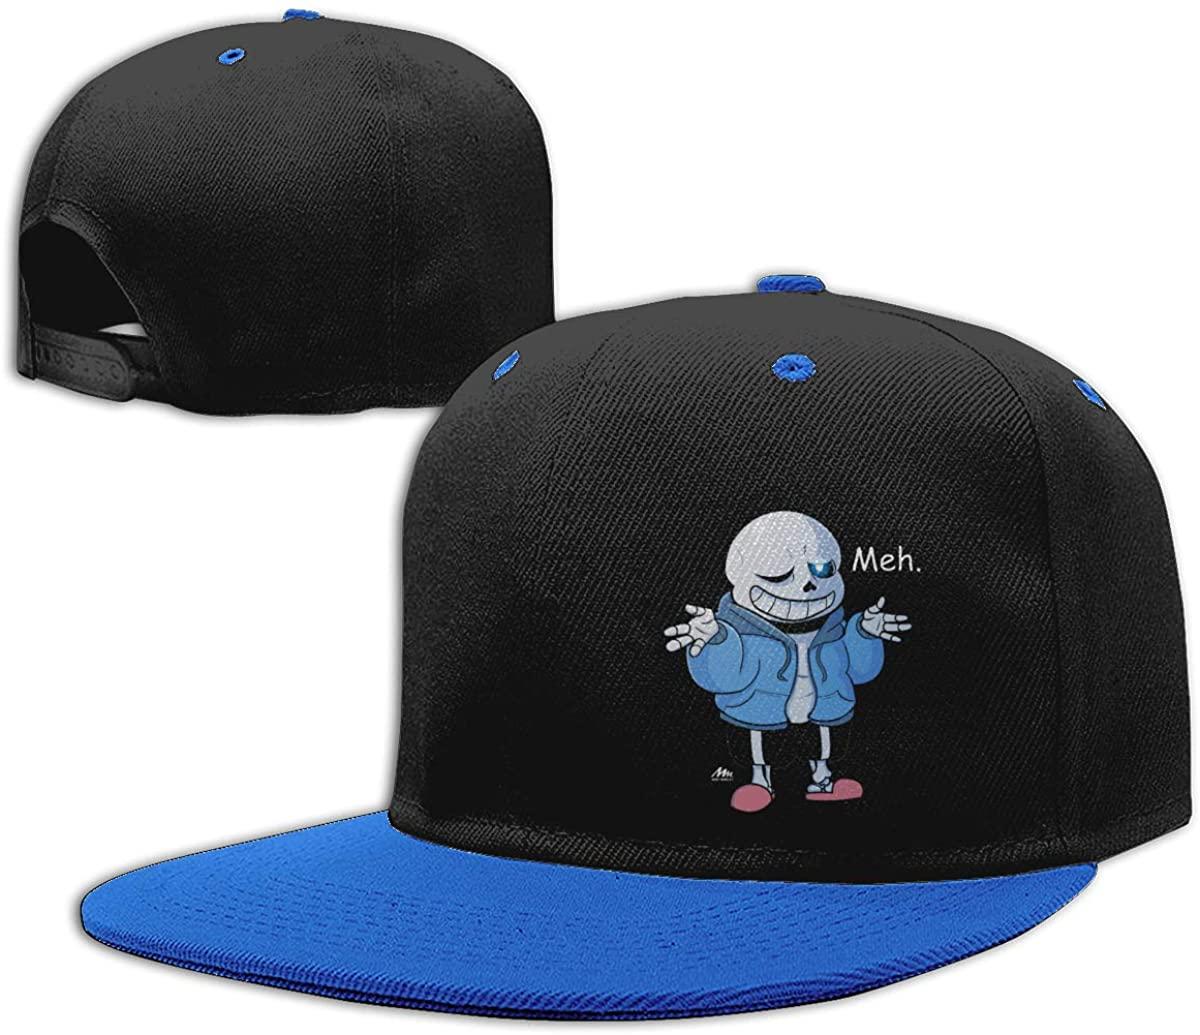 NYF Baseball Caps Boys Girls Snapback Cap Trucker Hat Hip Hop Flat Brim Hat for Kids Teens Youth